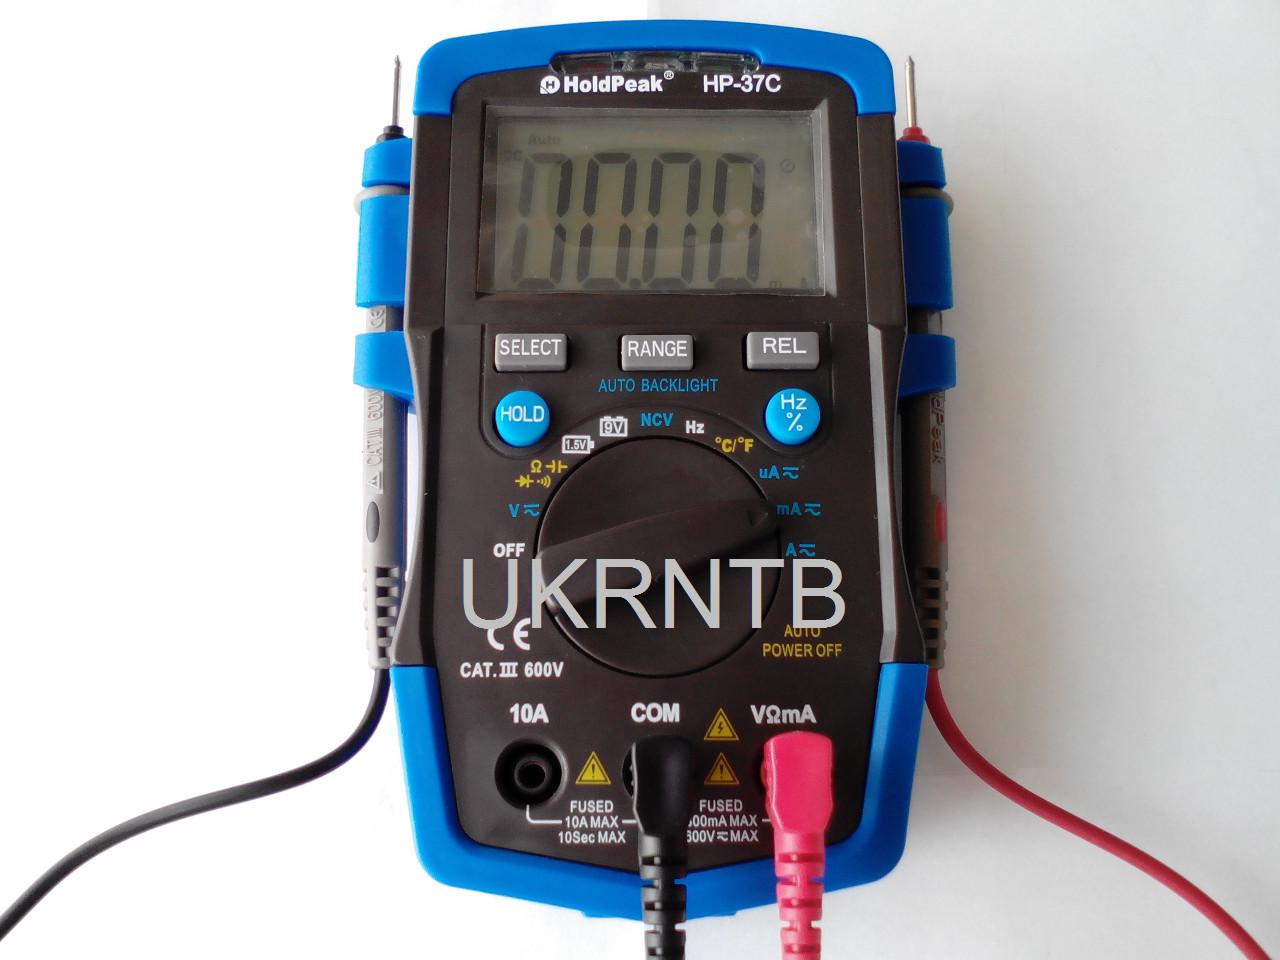 Мультиметр / Тестер HP-37C с автоматическим выбором диапазонов, True RMS, тест аккумуляторов/батареек, NCV - NTB в Виннице